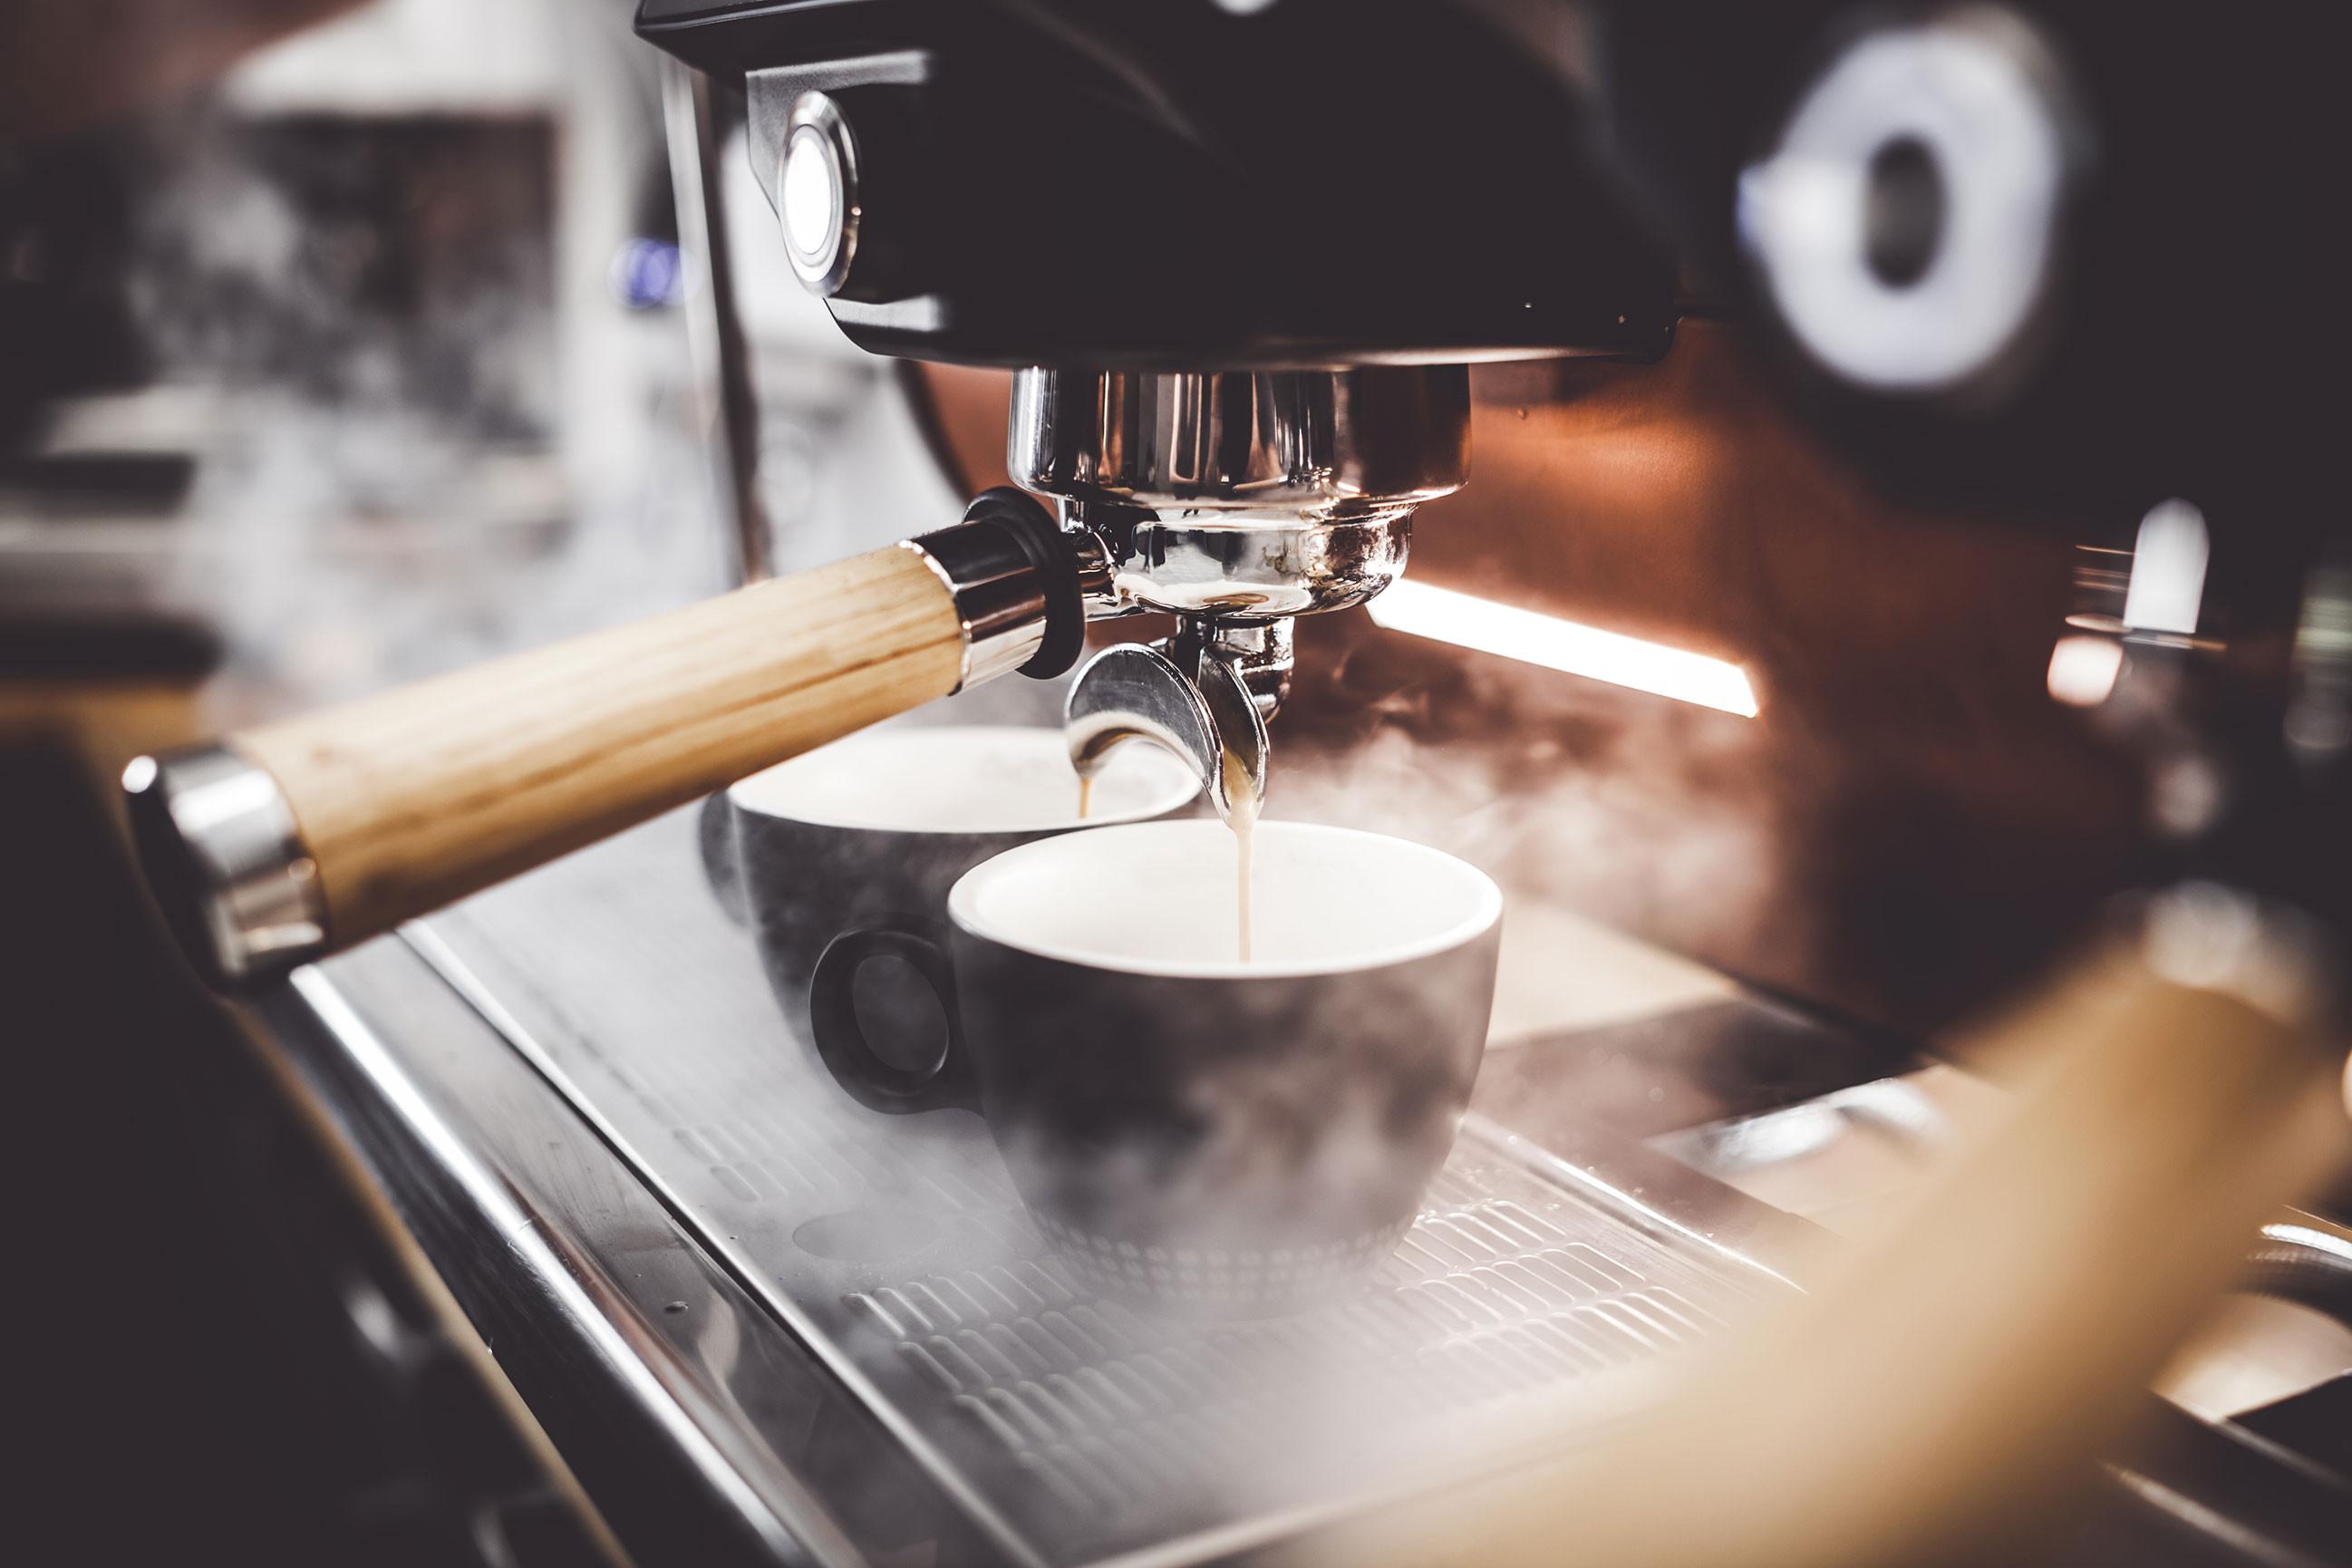 Notting Hill Coffee, salon de café à Marcq-en-Baroeul